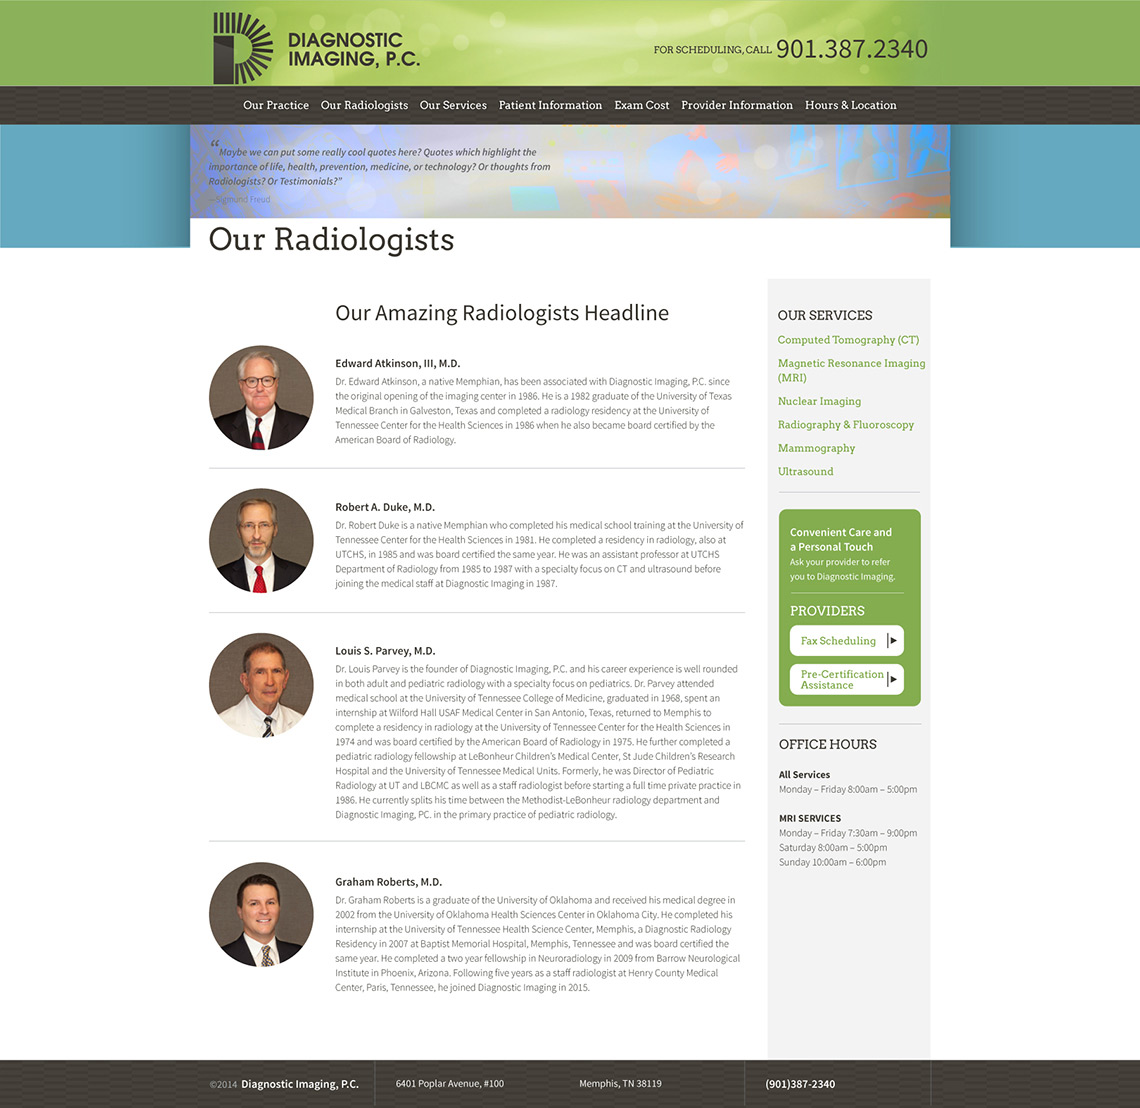 Diagnostic Imaging Web Design Our Radiologists